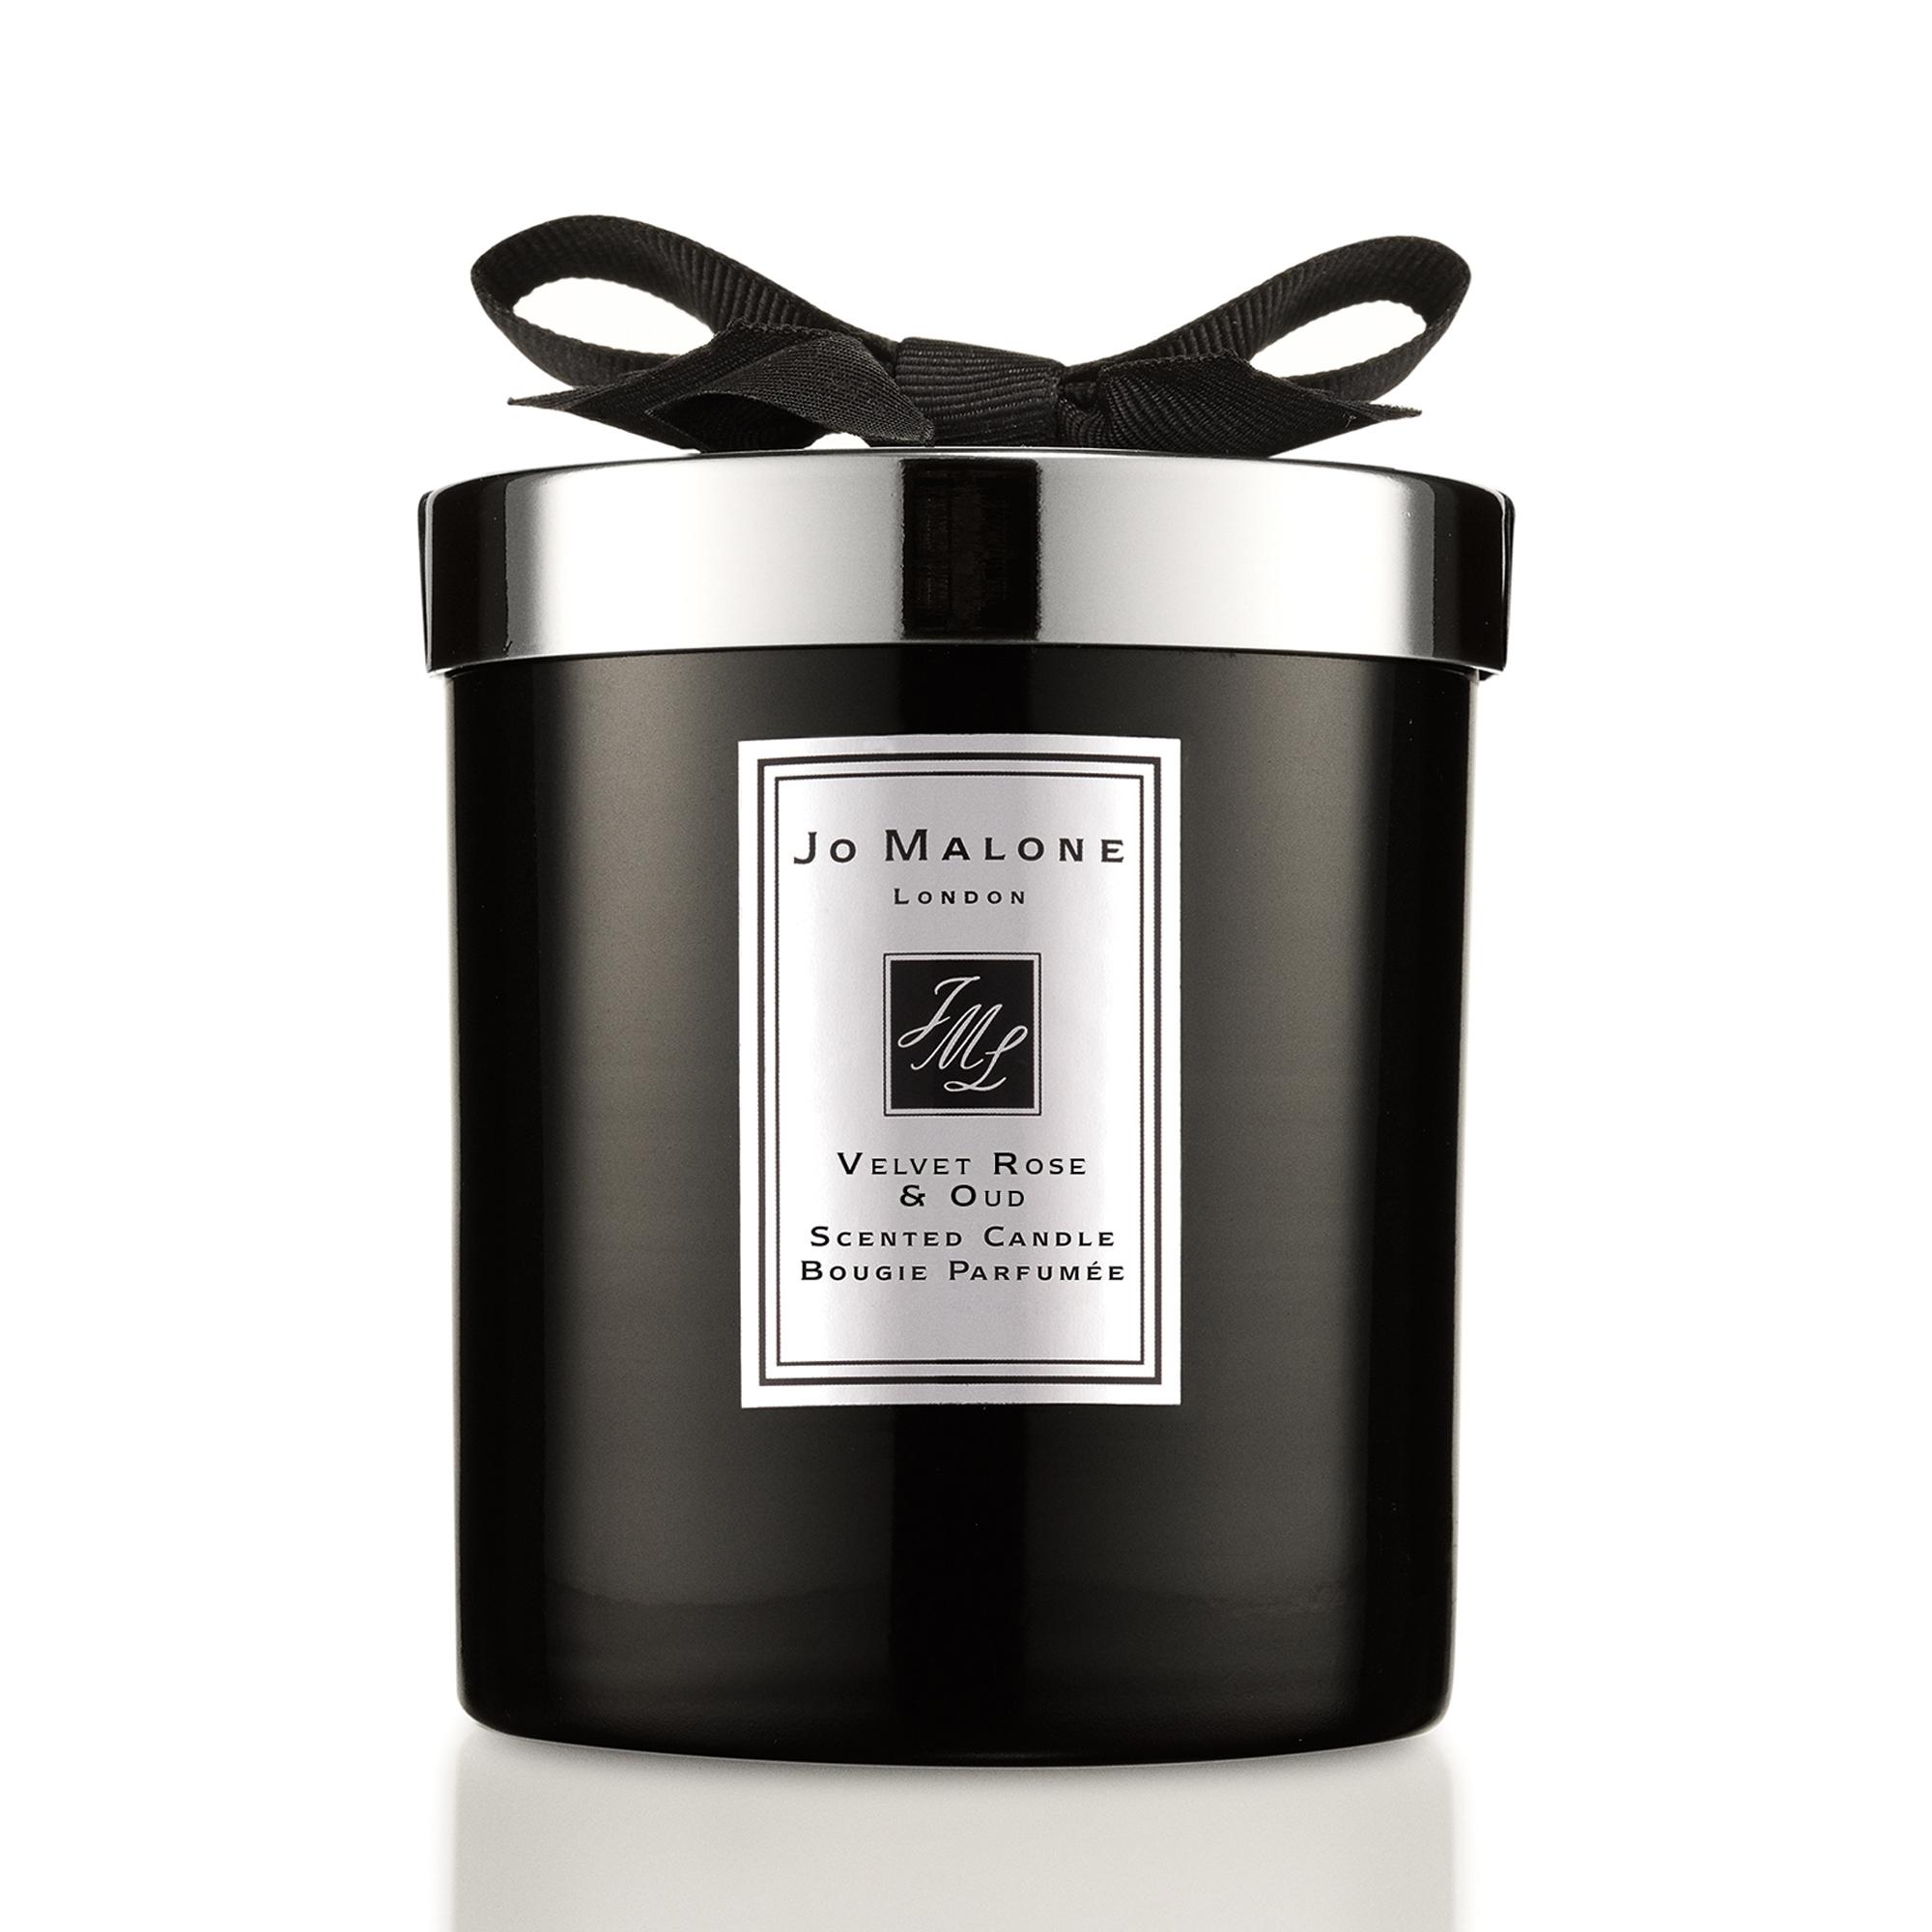 Velvet Rose & Oud Home Candle 200g